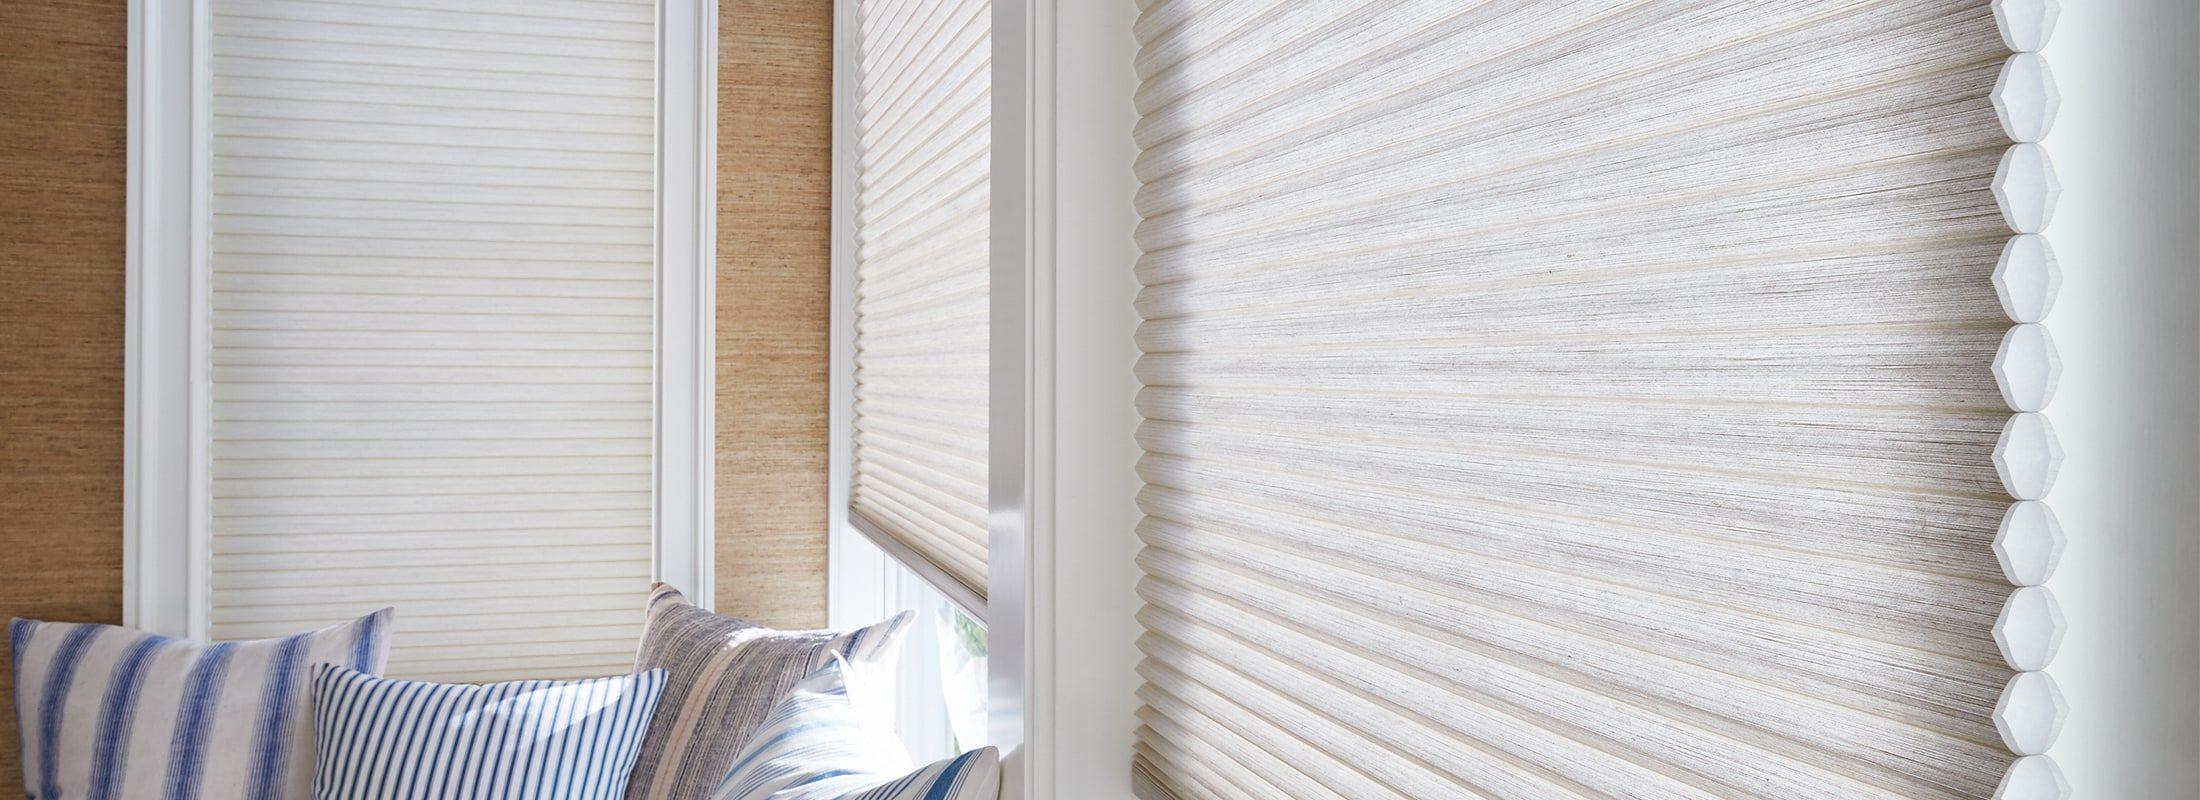 Charmant Duette Fabric: Architella® Alexa Color: Desert Sands